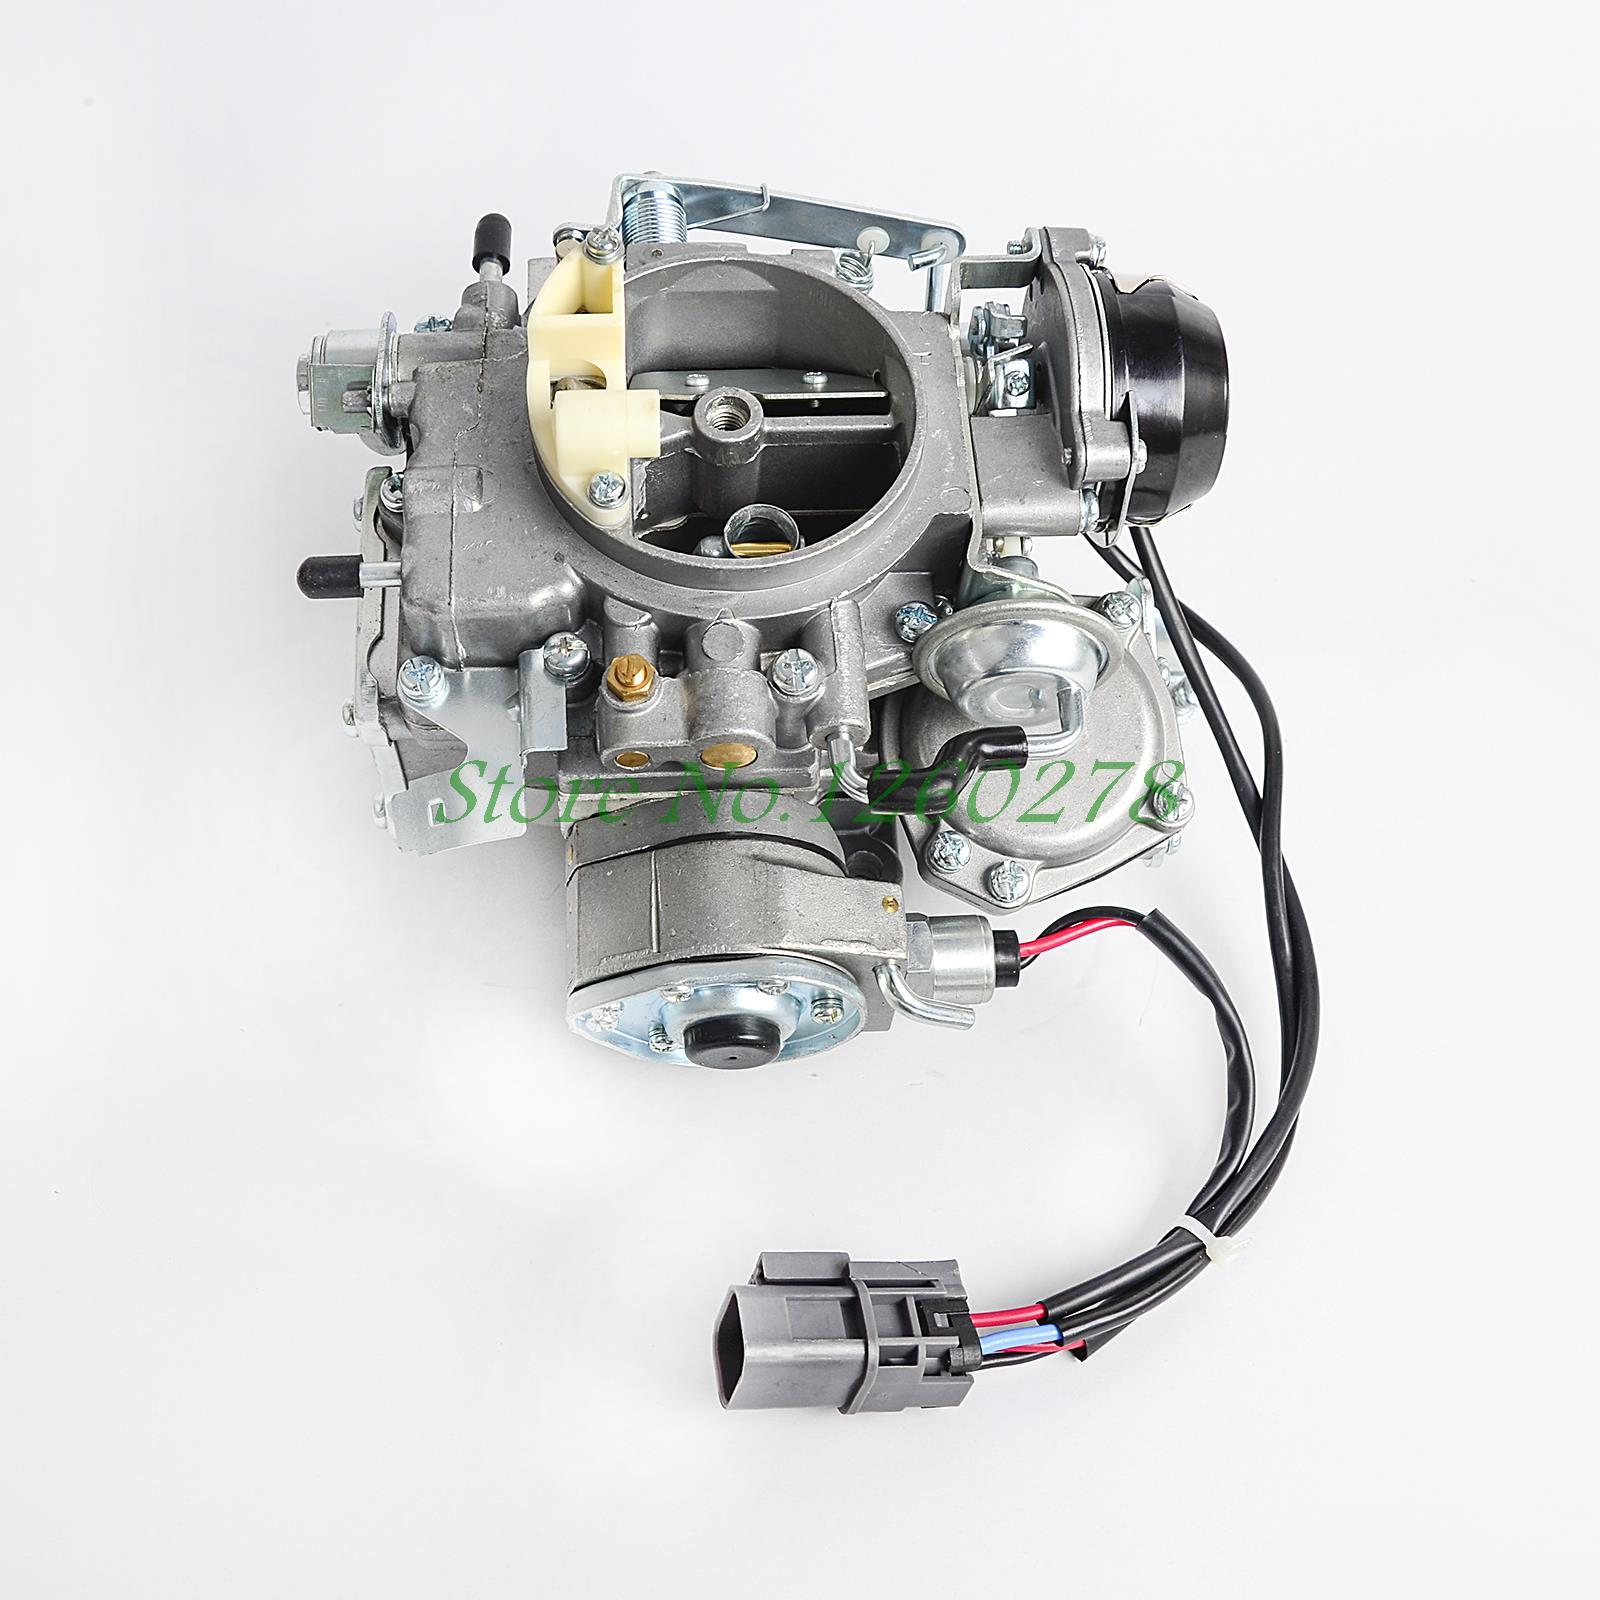 Antonio Carraro 3800 Hst Filter Service Set mit Lombardini Motor